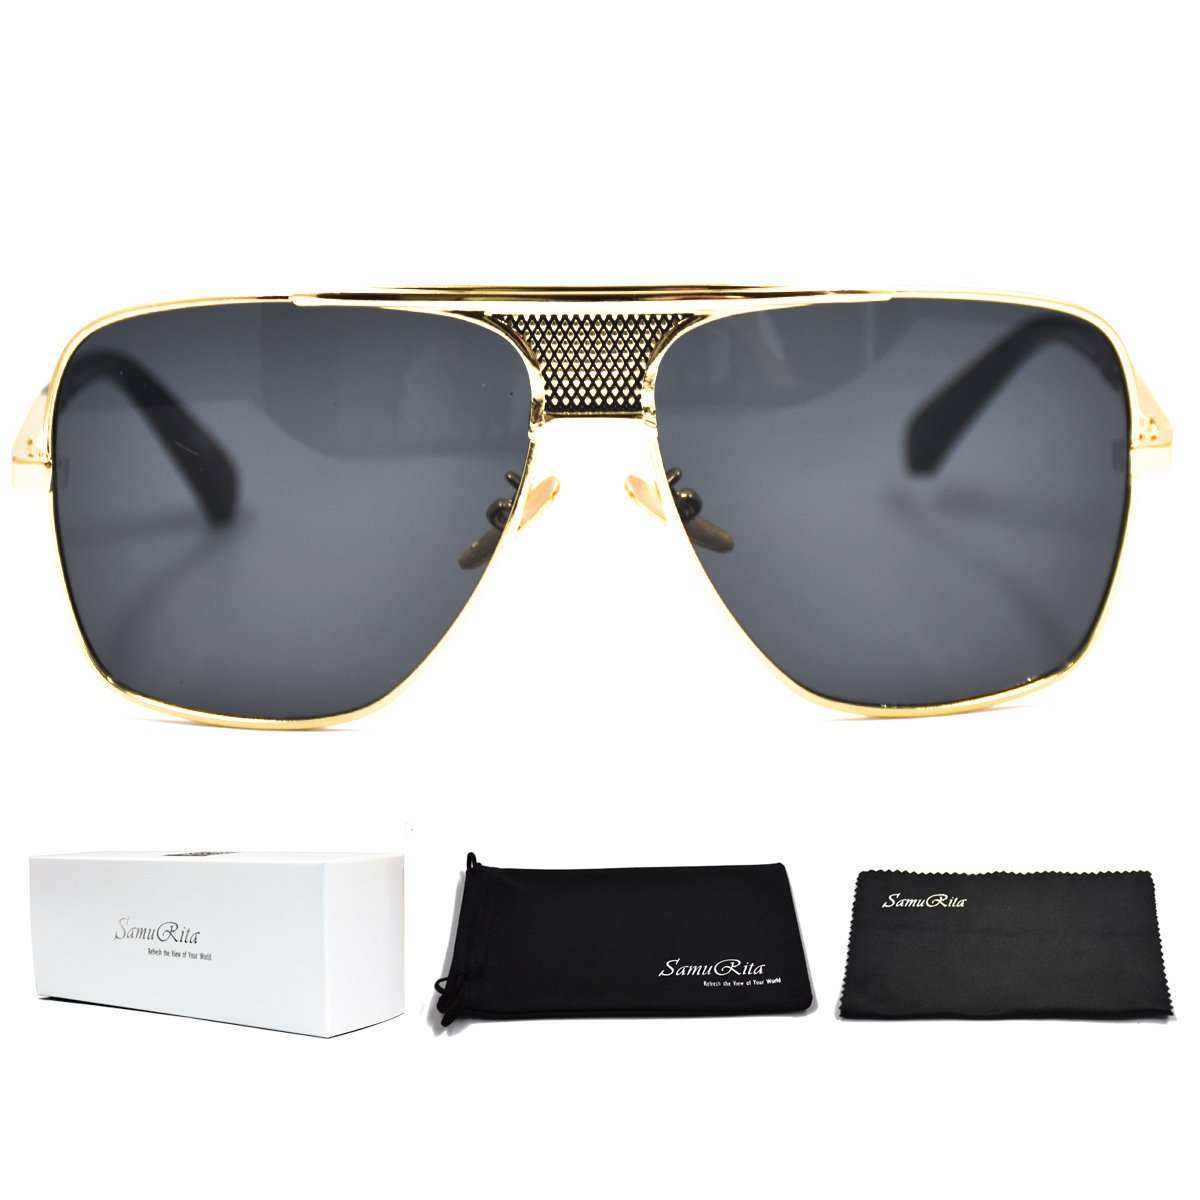 fccfcbd00 Amazon.com: SamuRita Metal Celebrity Flat Top Aviator Sunglasses Oversized  Designer Shades(Black Lens/Gold Frame): Clothing